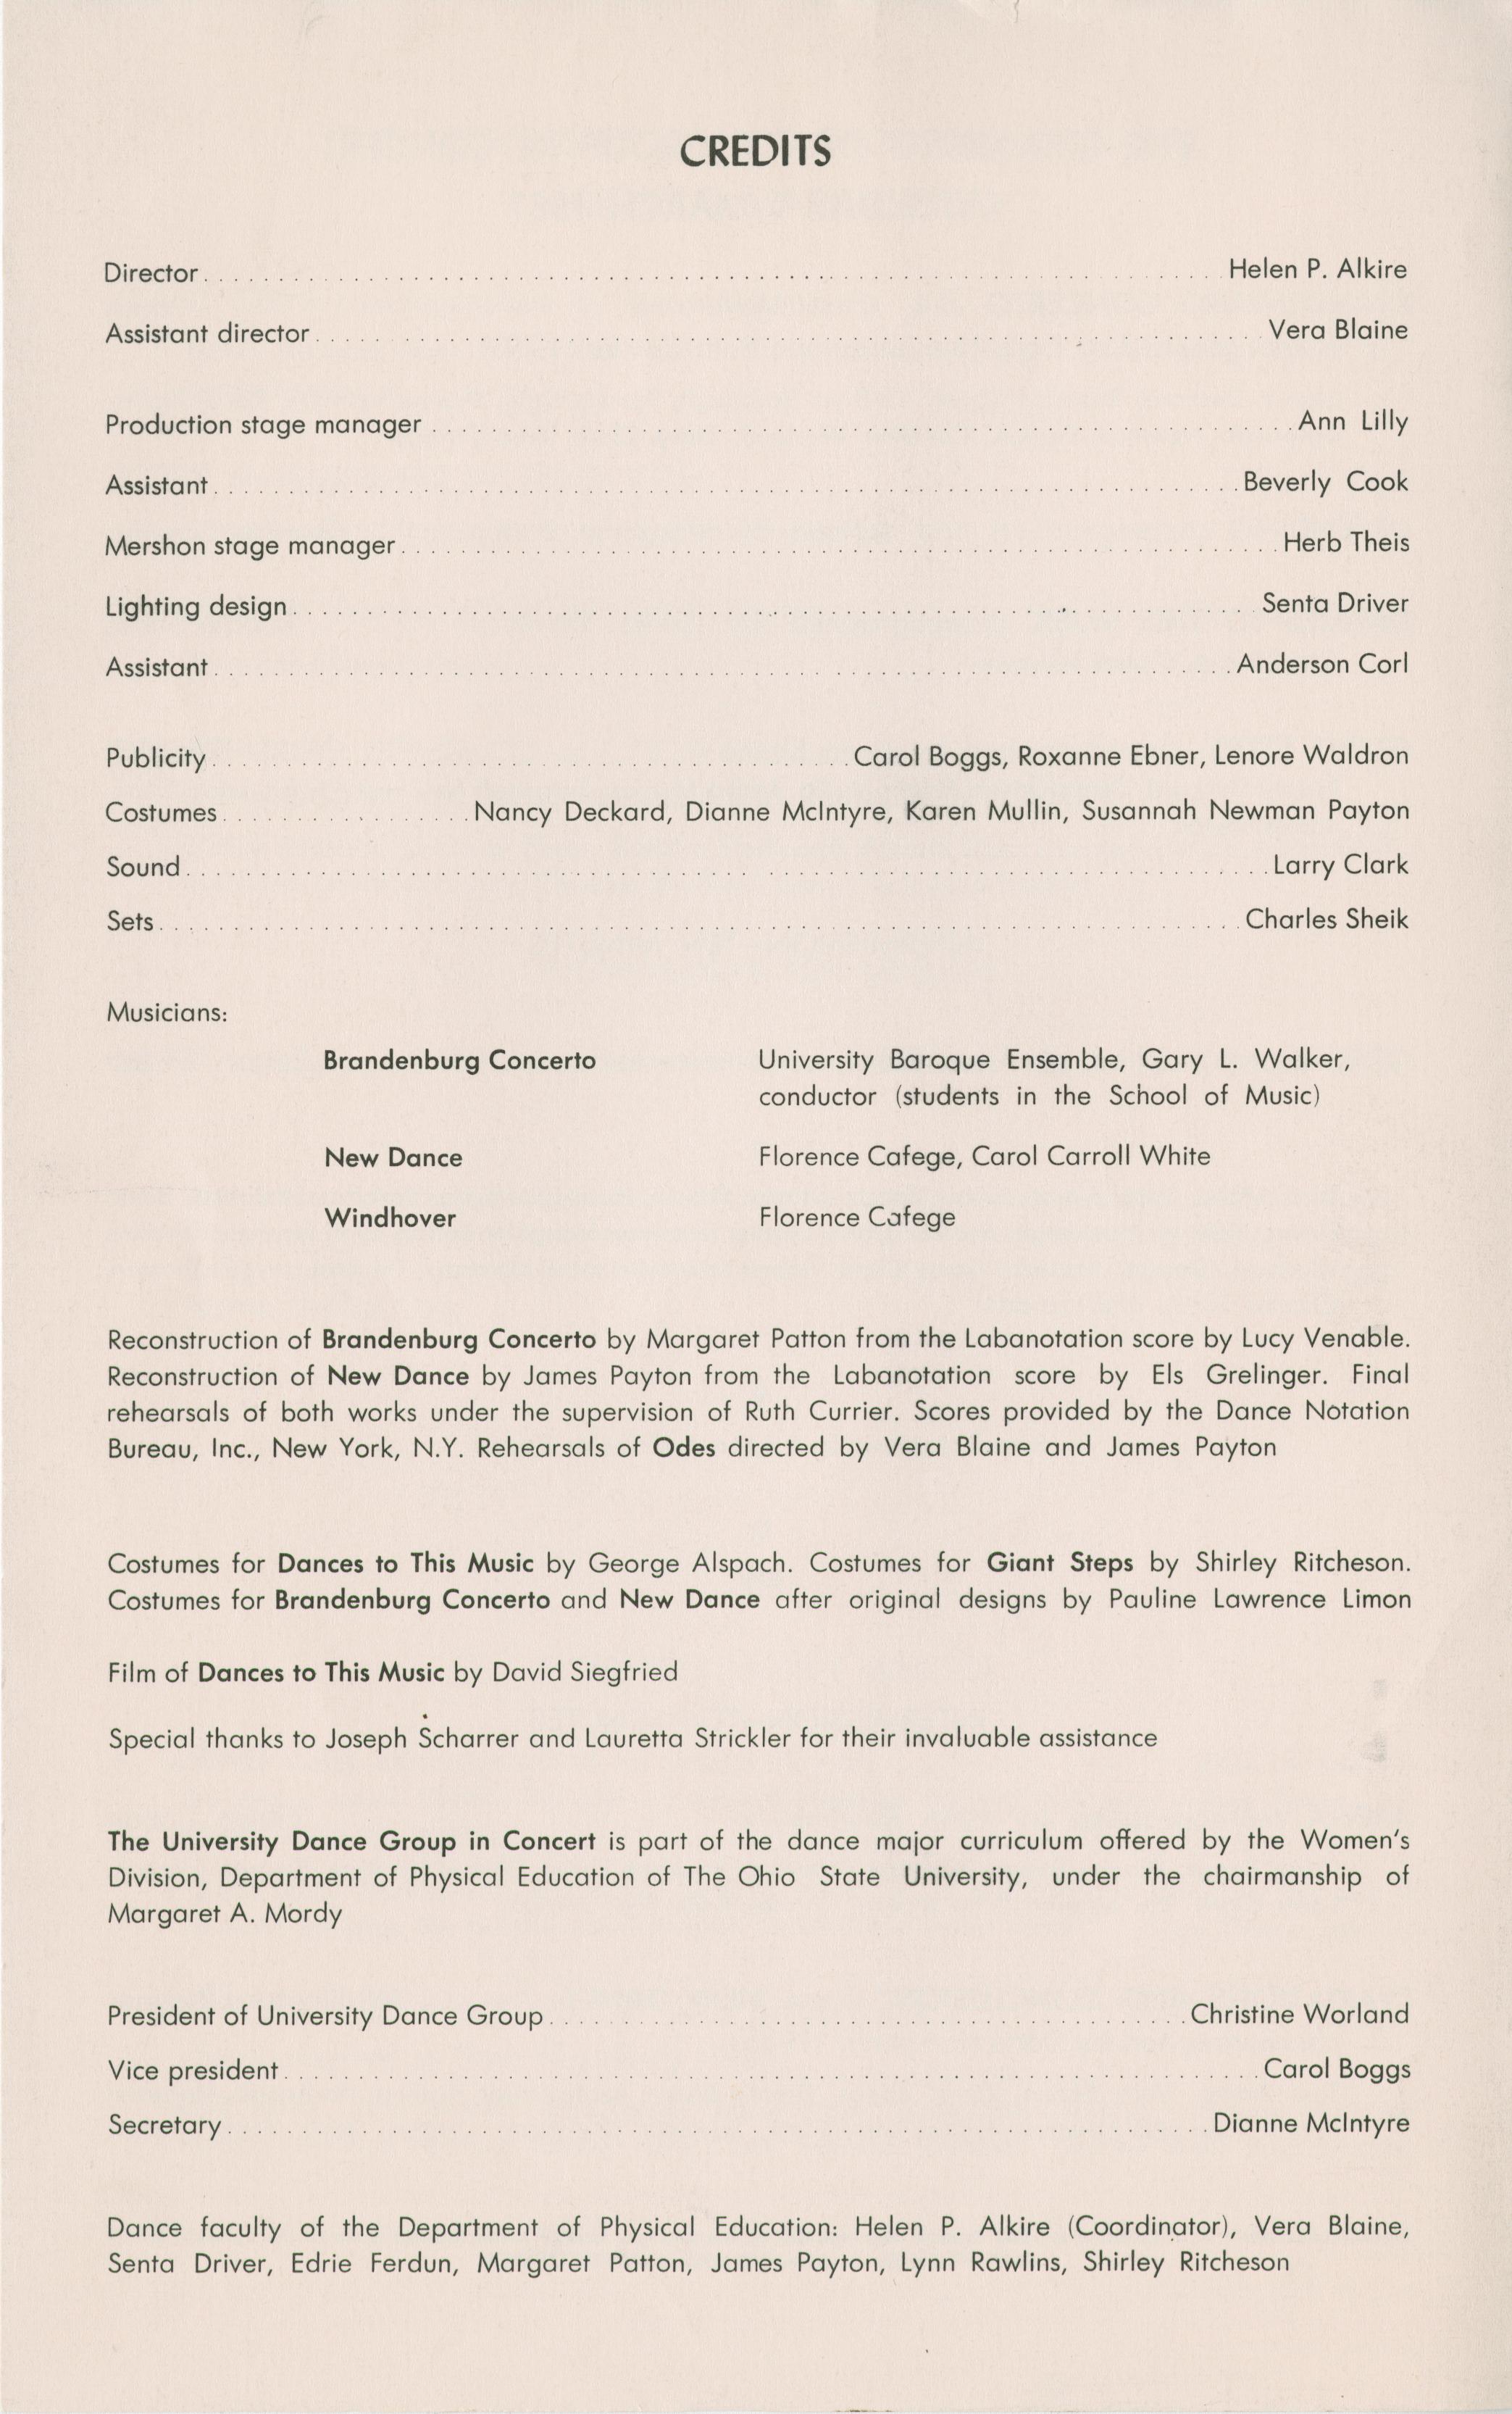 UDG_1967_DancePrograms-018-003.jpg